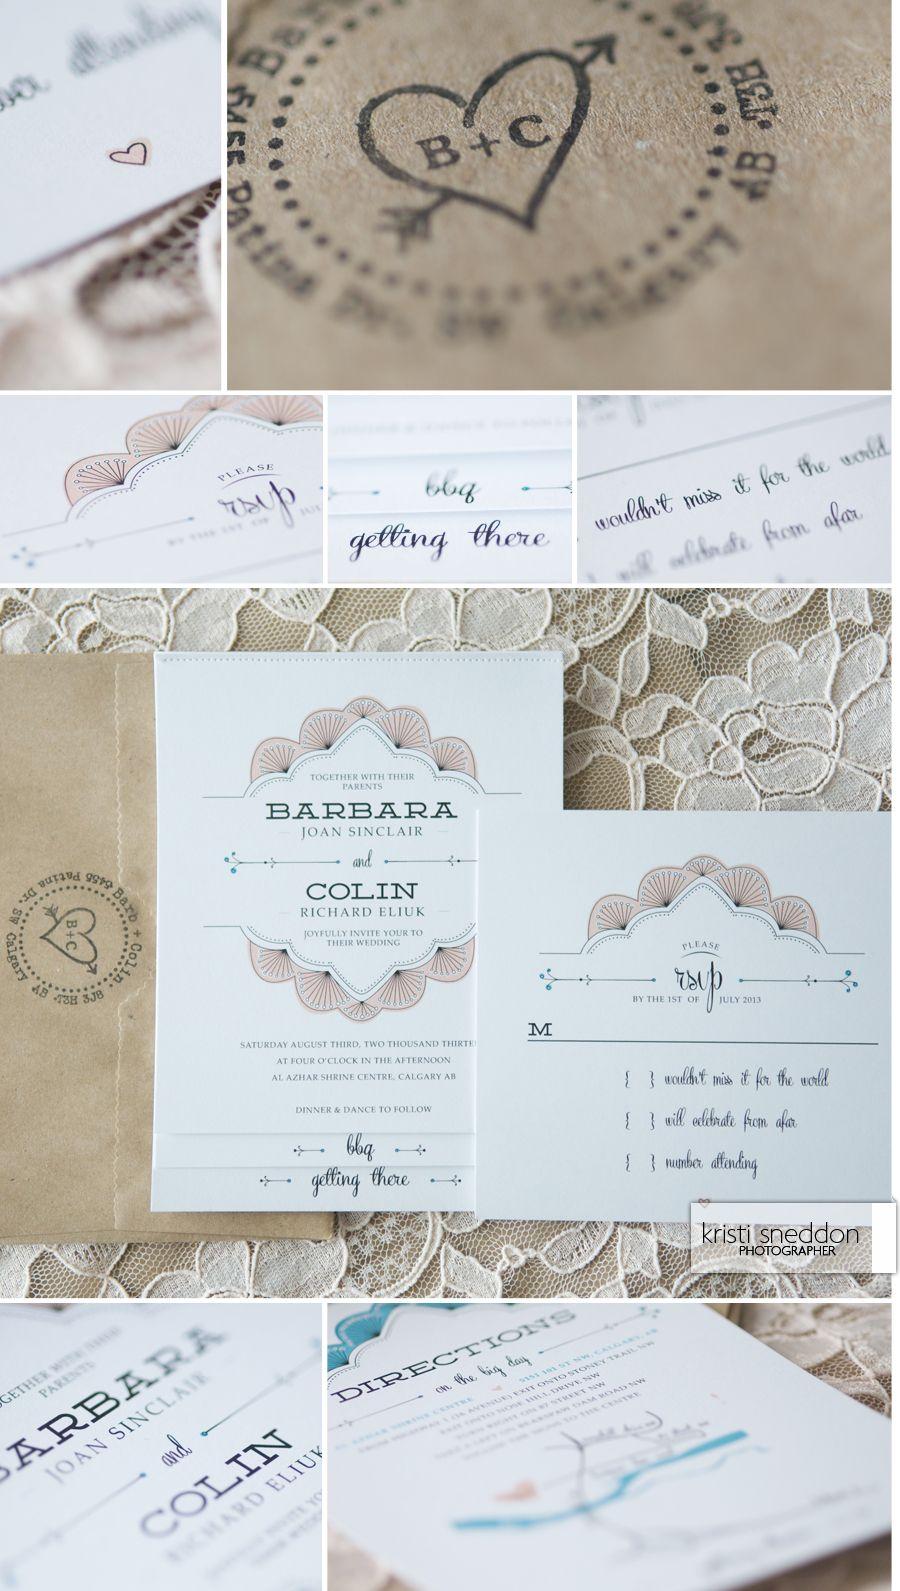 Gorgeous DIY wedding invitations